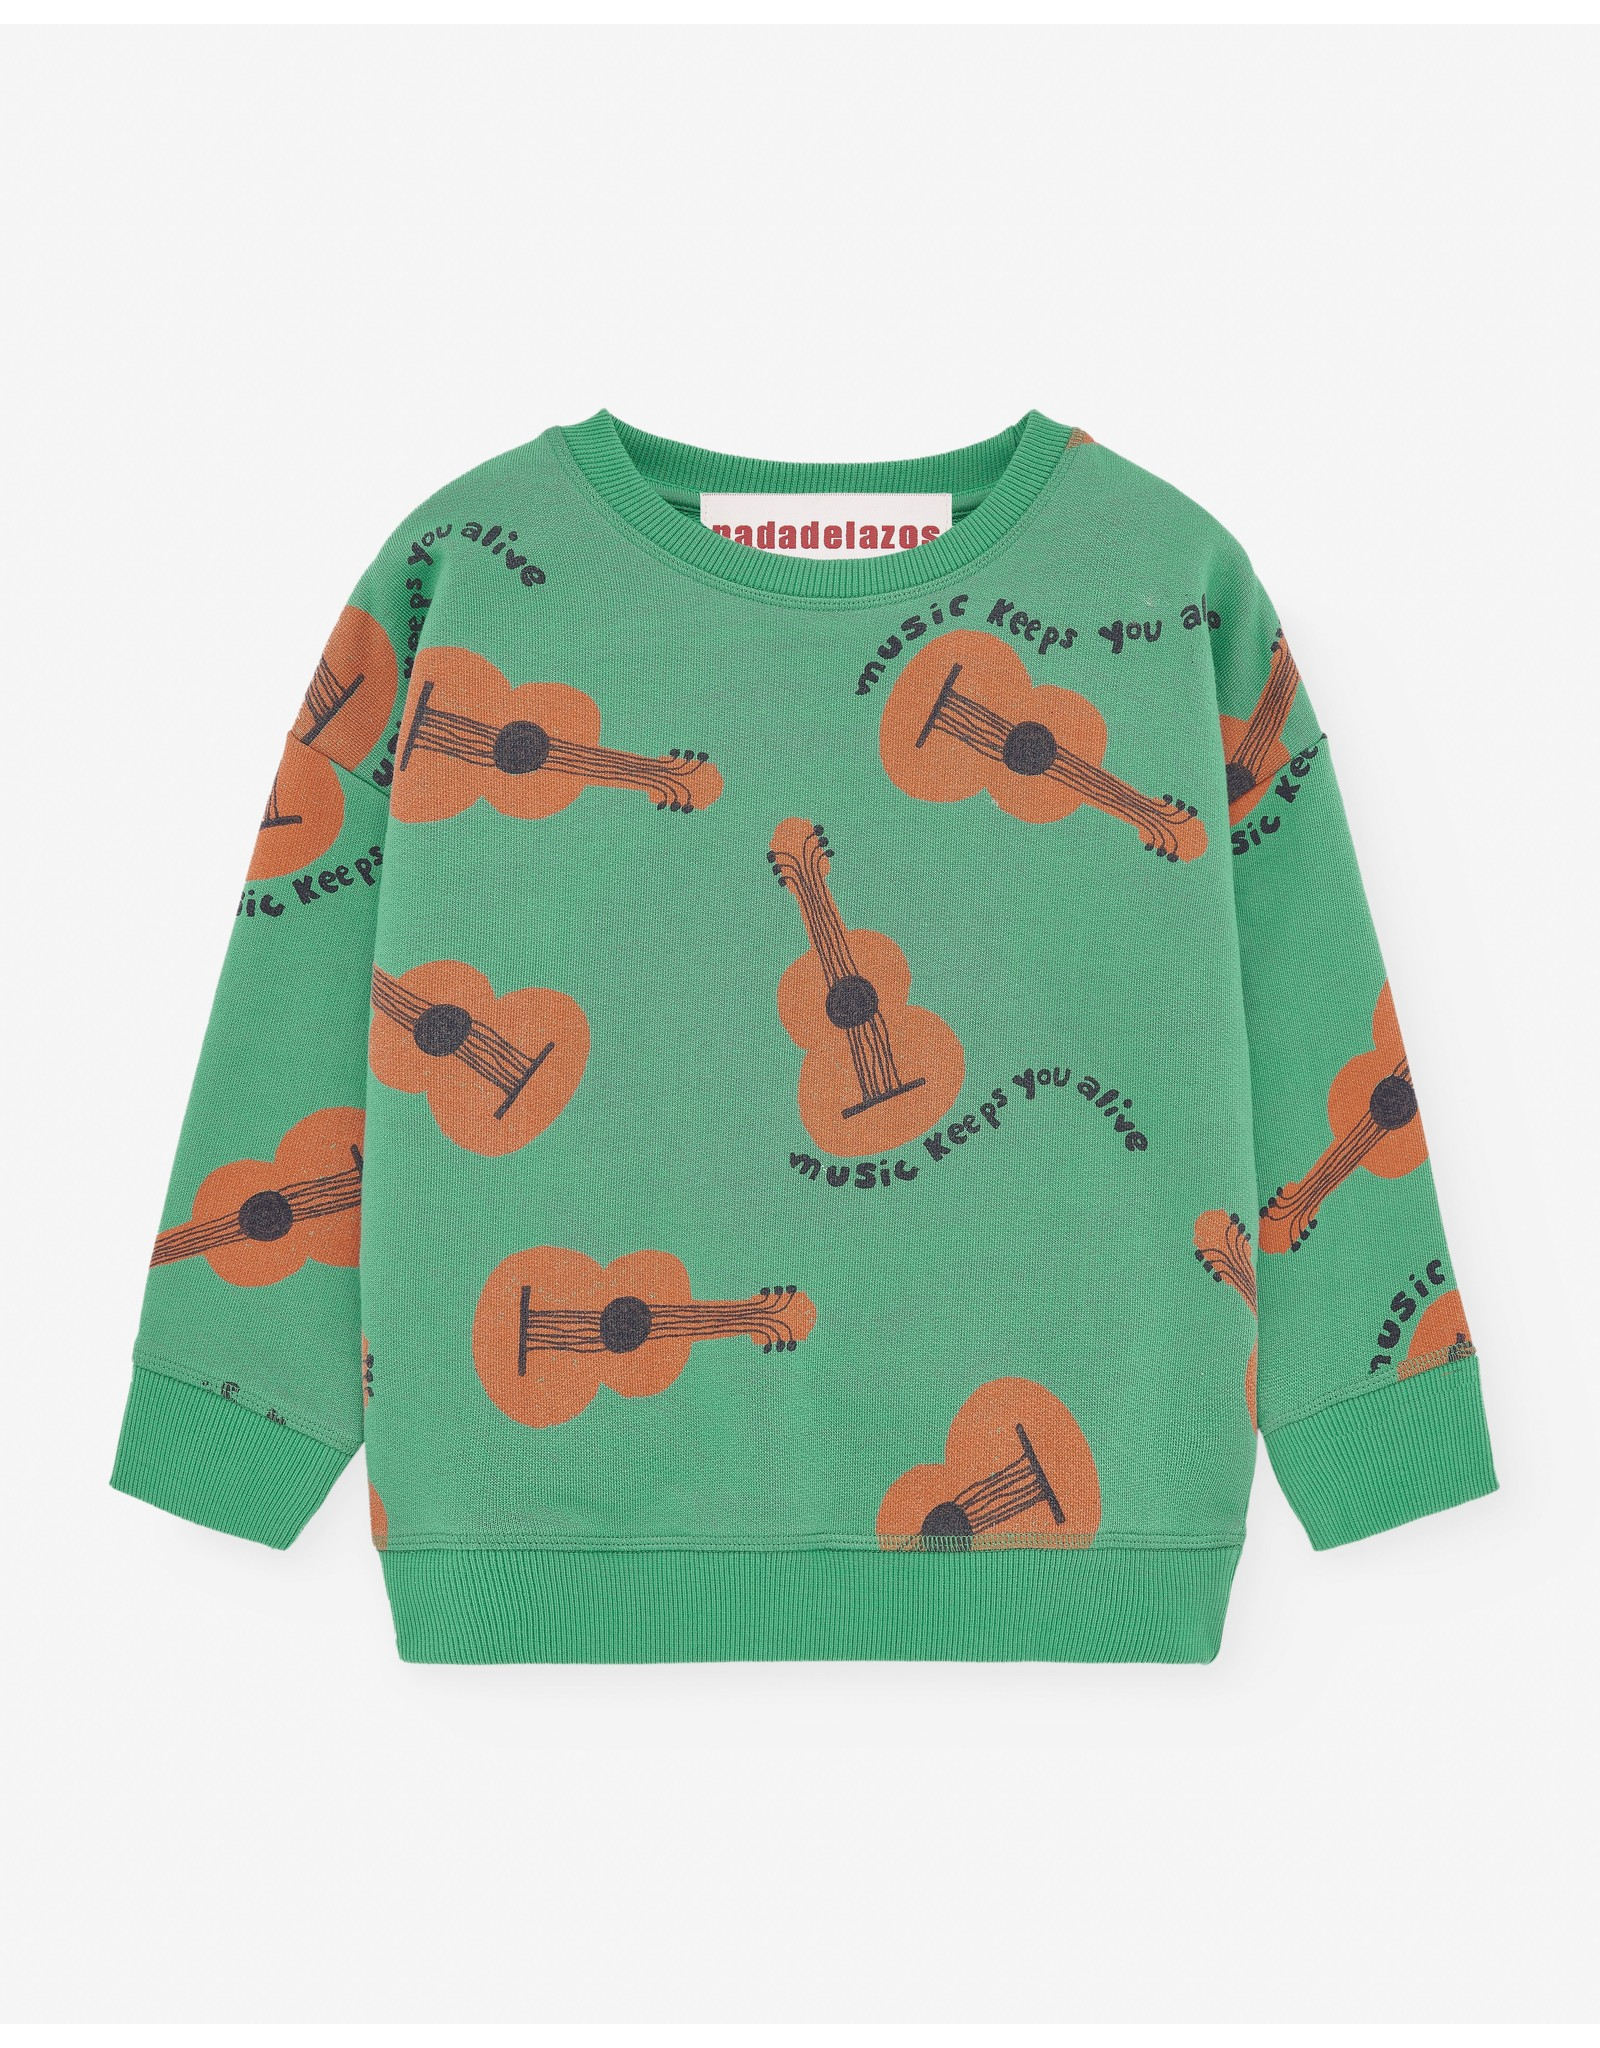 Nadadelazos Nadadelazos Sweatshirt Music Keeps You Alive Tree Green Light